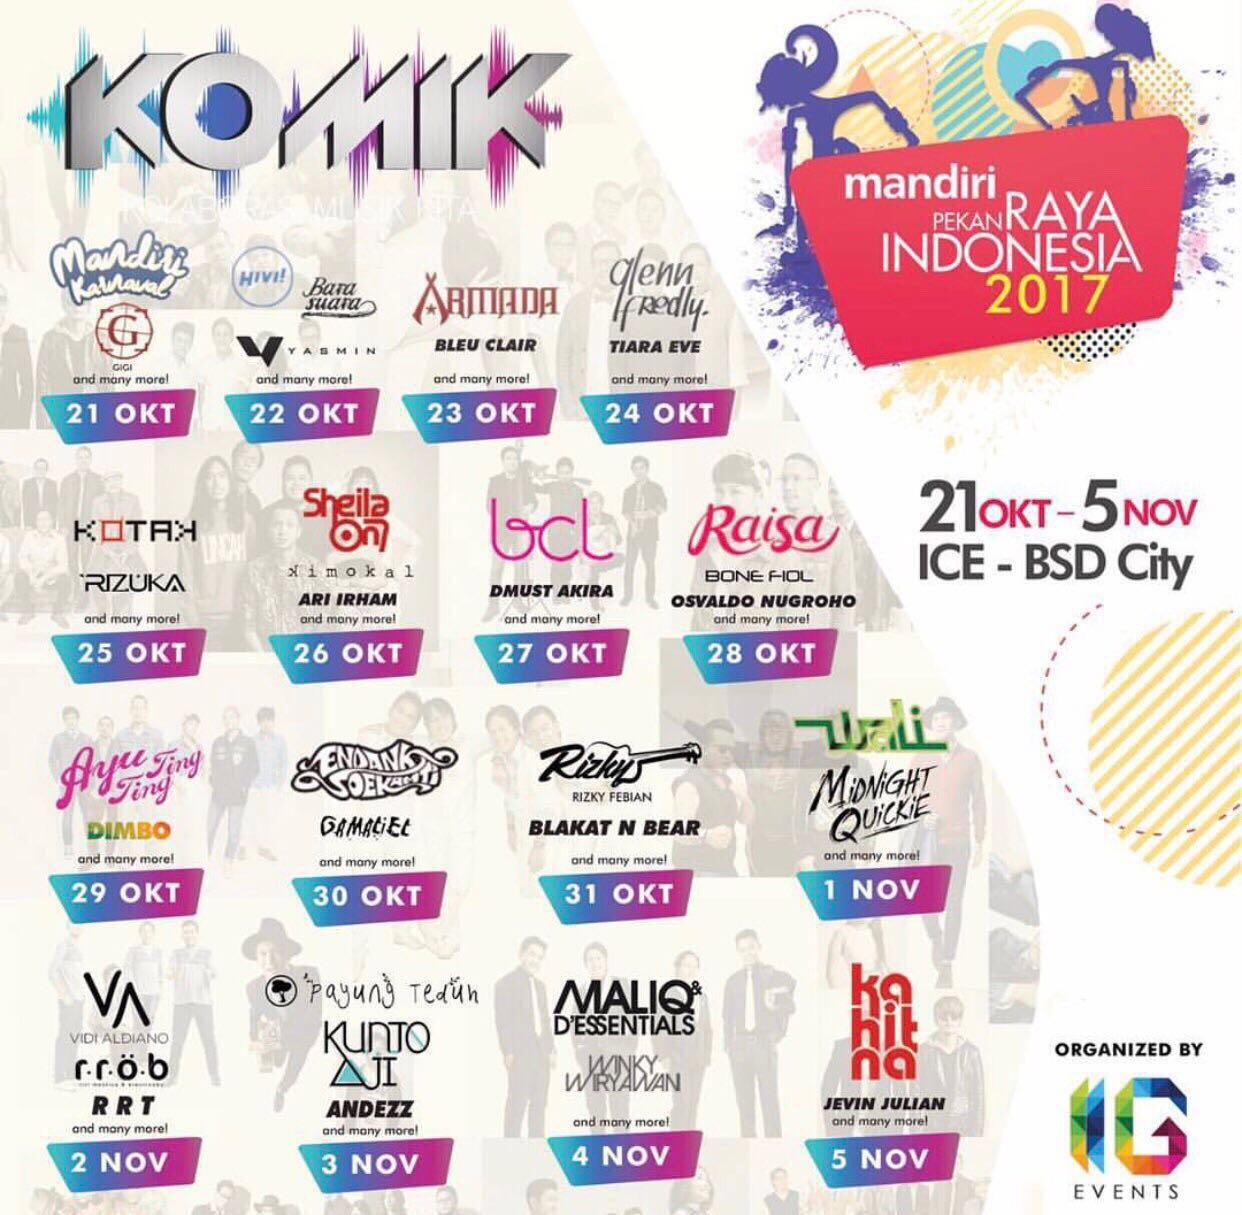 Kolaborasi Band Keren di Pekan Raya Indonesia 2017